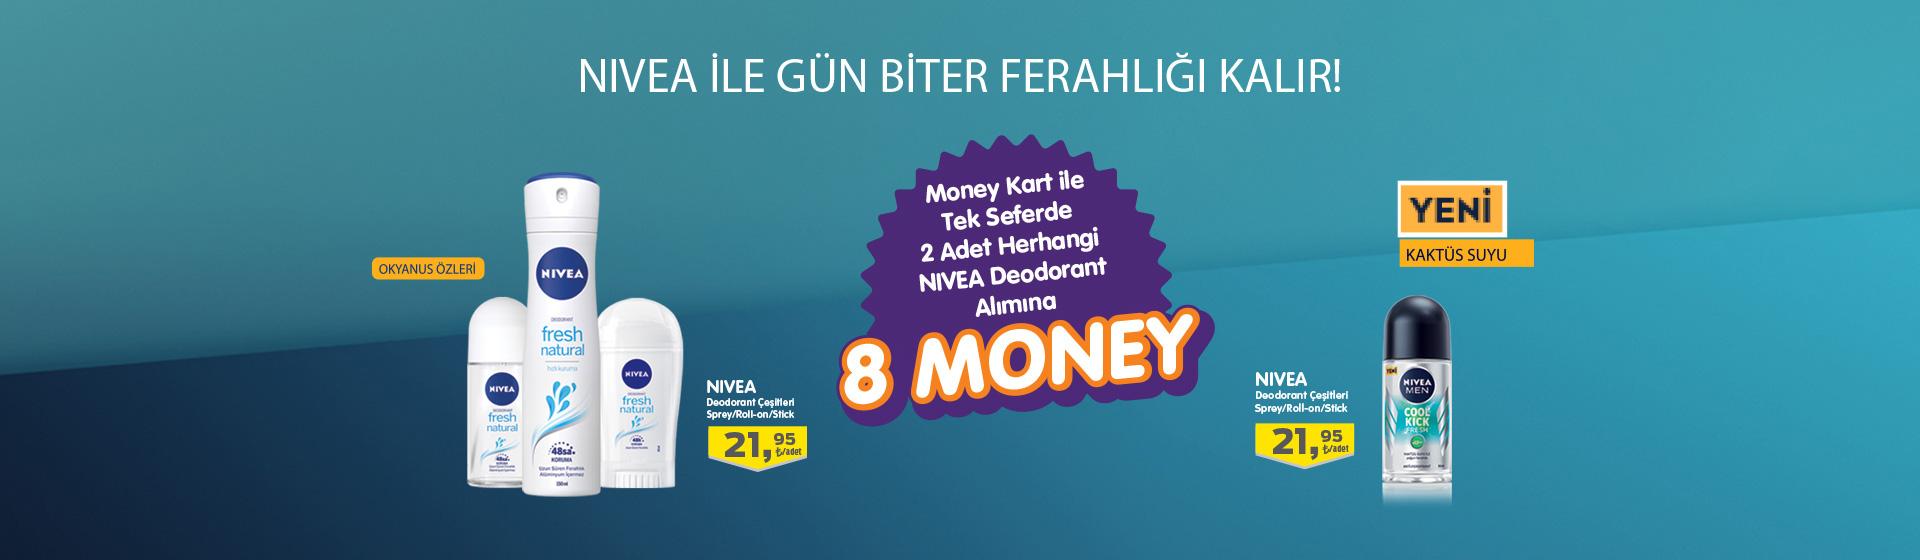 Nivea Deo Money Kampanyası